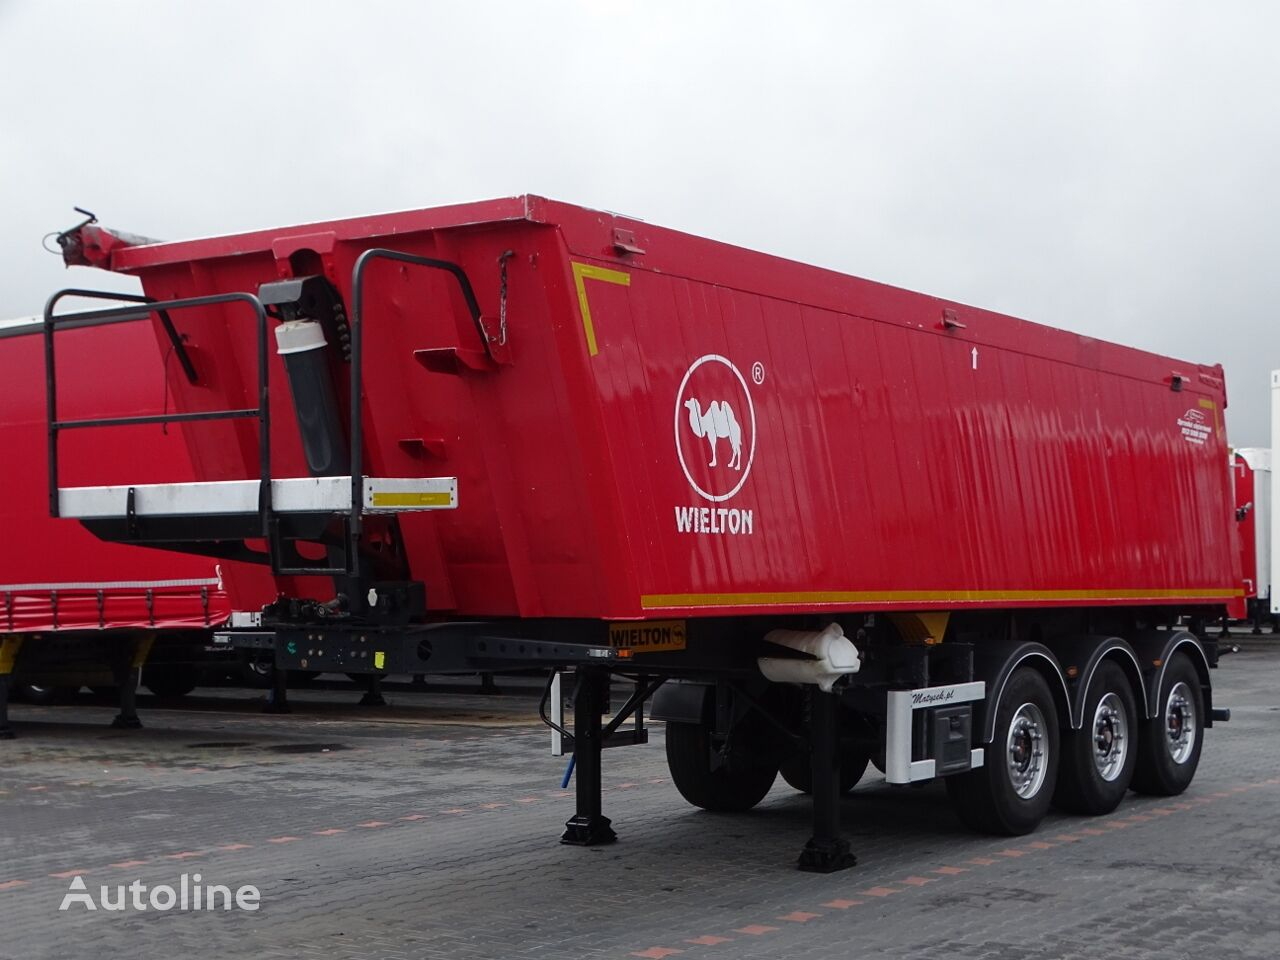 WIELTON TIPPER - 33 M3 / ALUMINIUM MULD / LIFTED AXLE / 5 000 KG !!! /  tipper semi-trailer